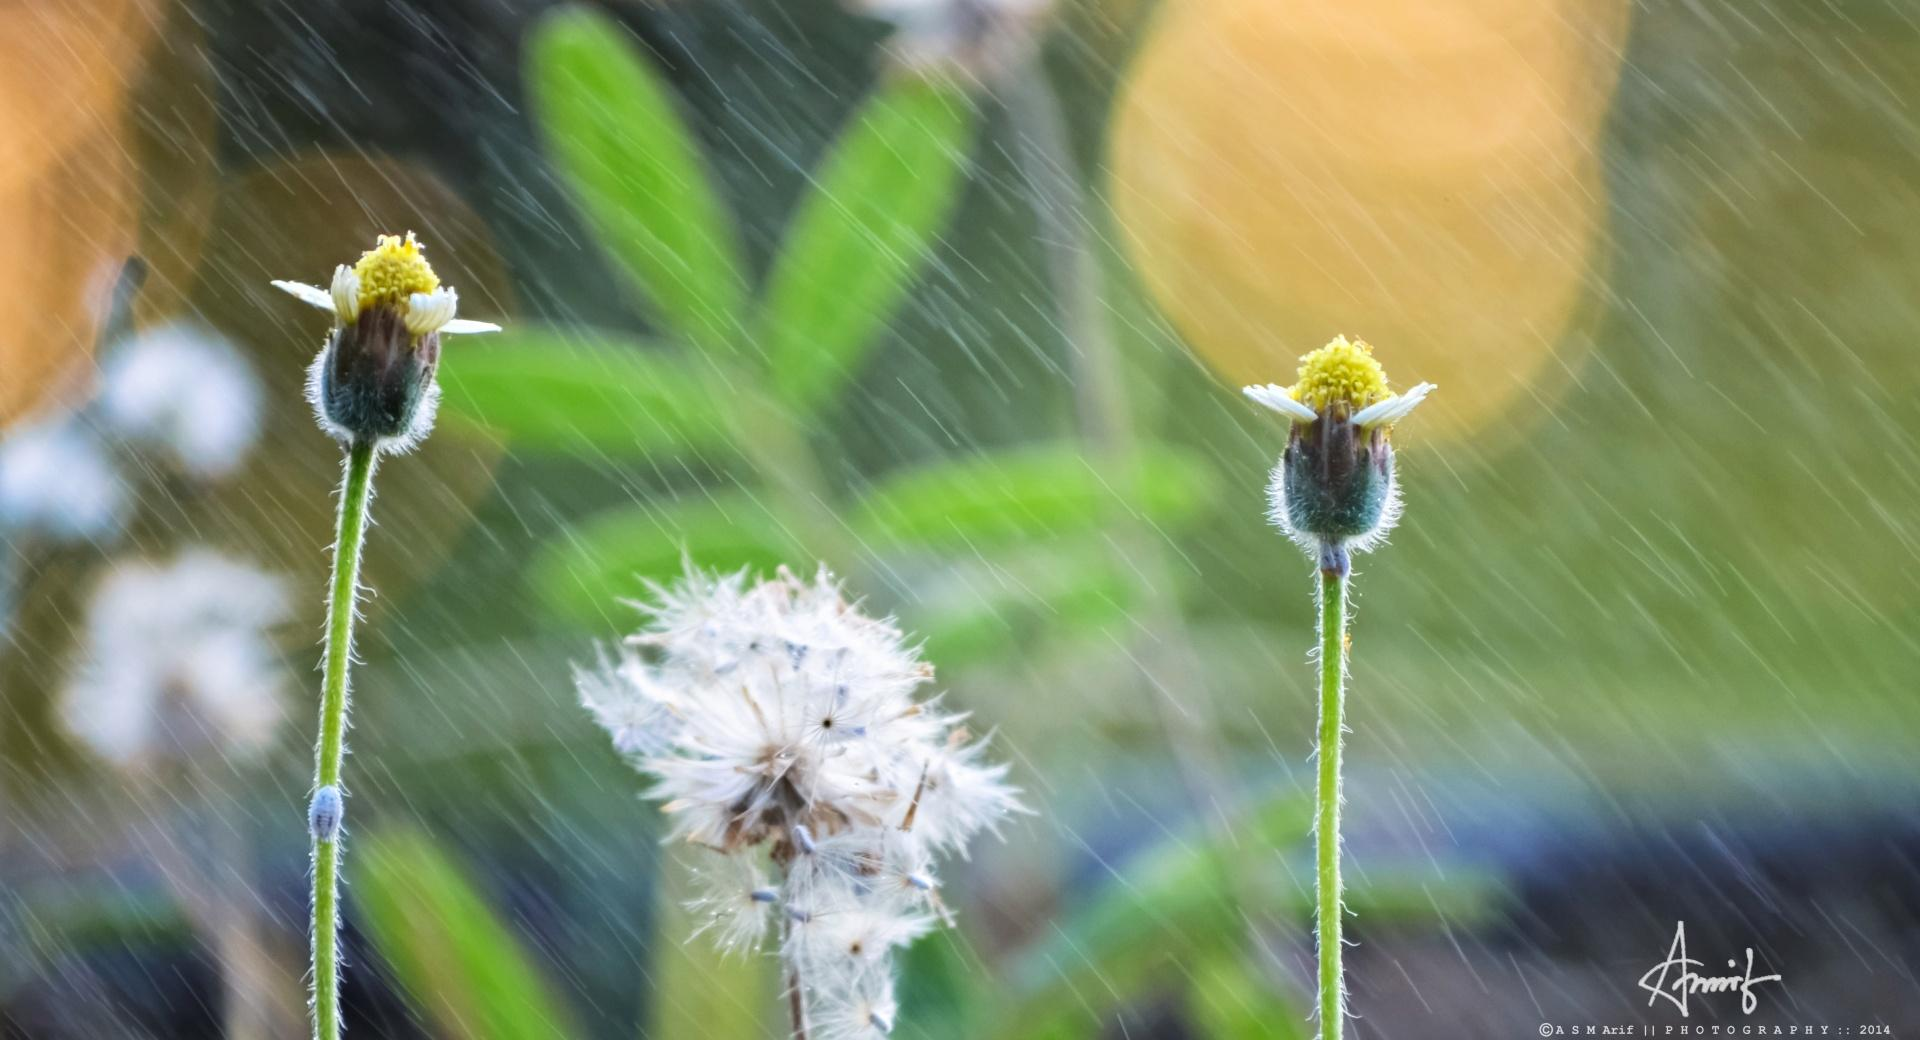 Rain Flower wallpapers HD quality